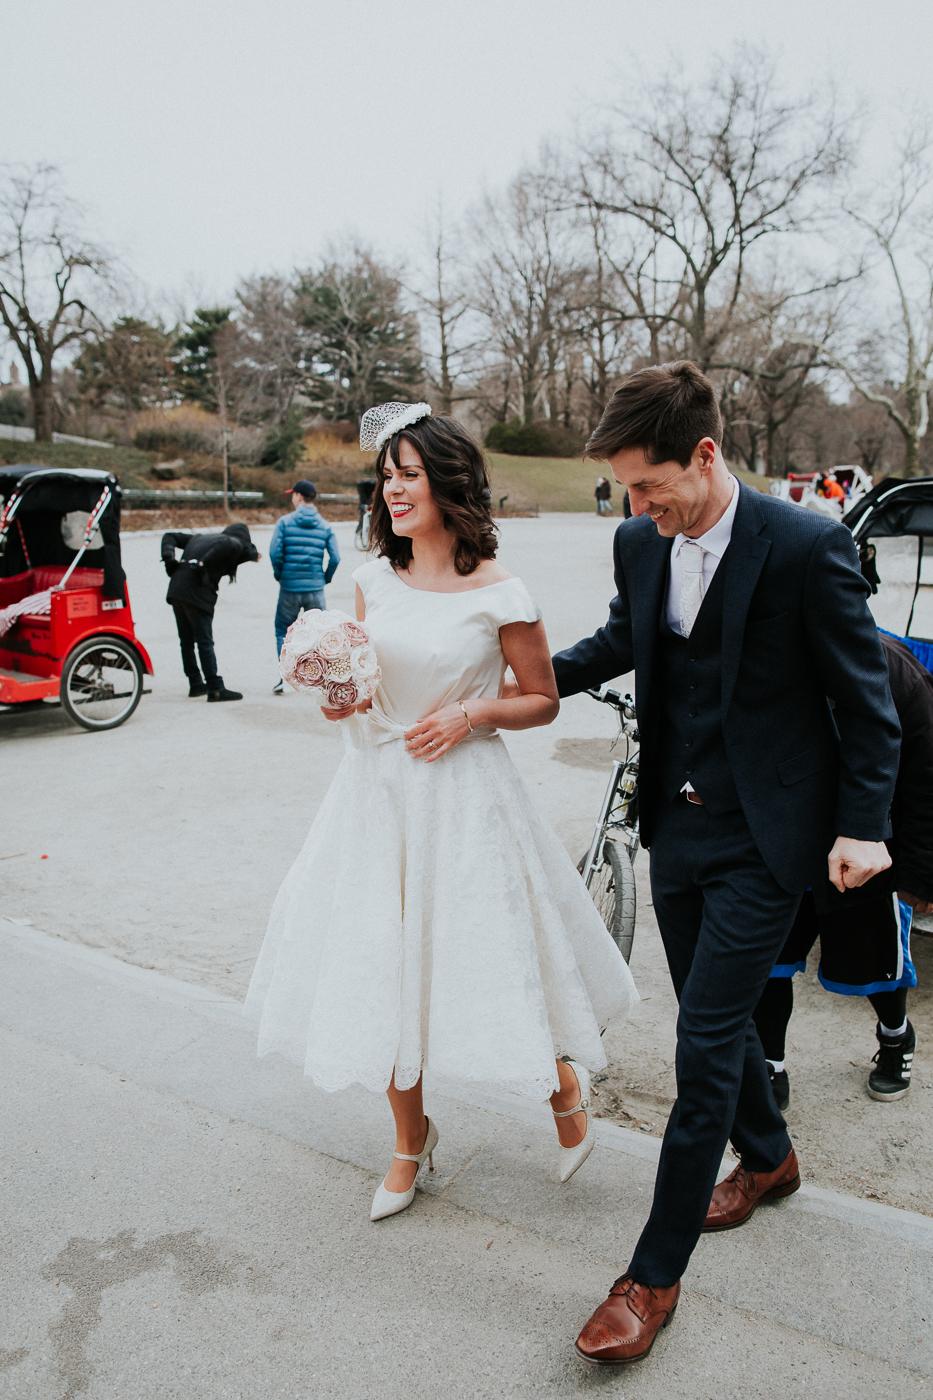 Ladies-Pavilion-Central-Park-NYC-Documentary-Elopement-Wedding-Photographer-47.jpg